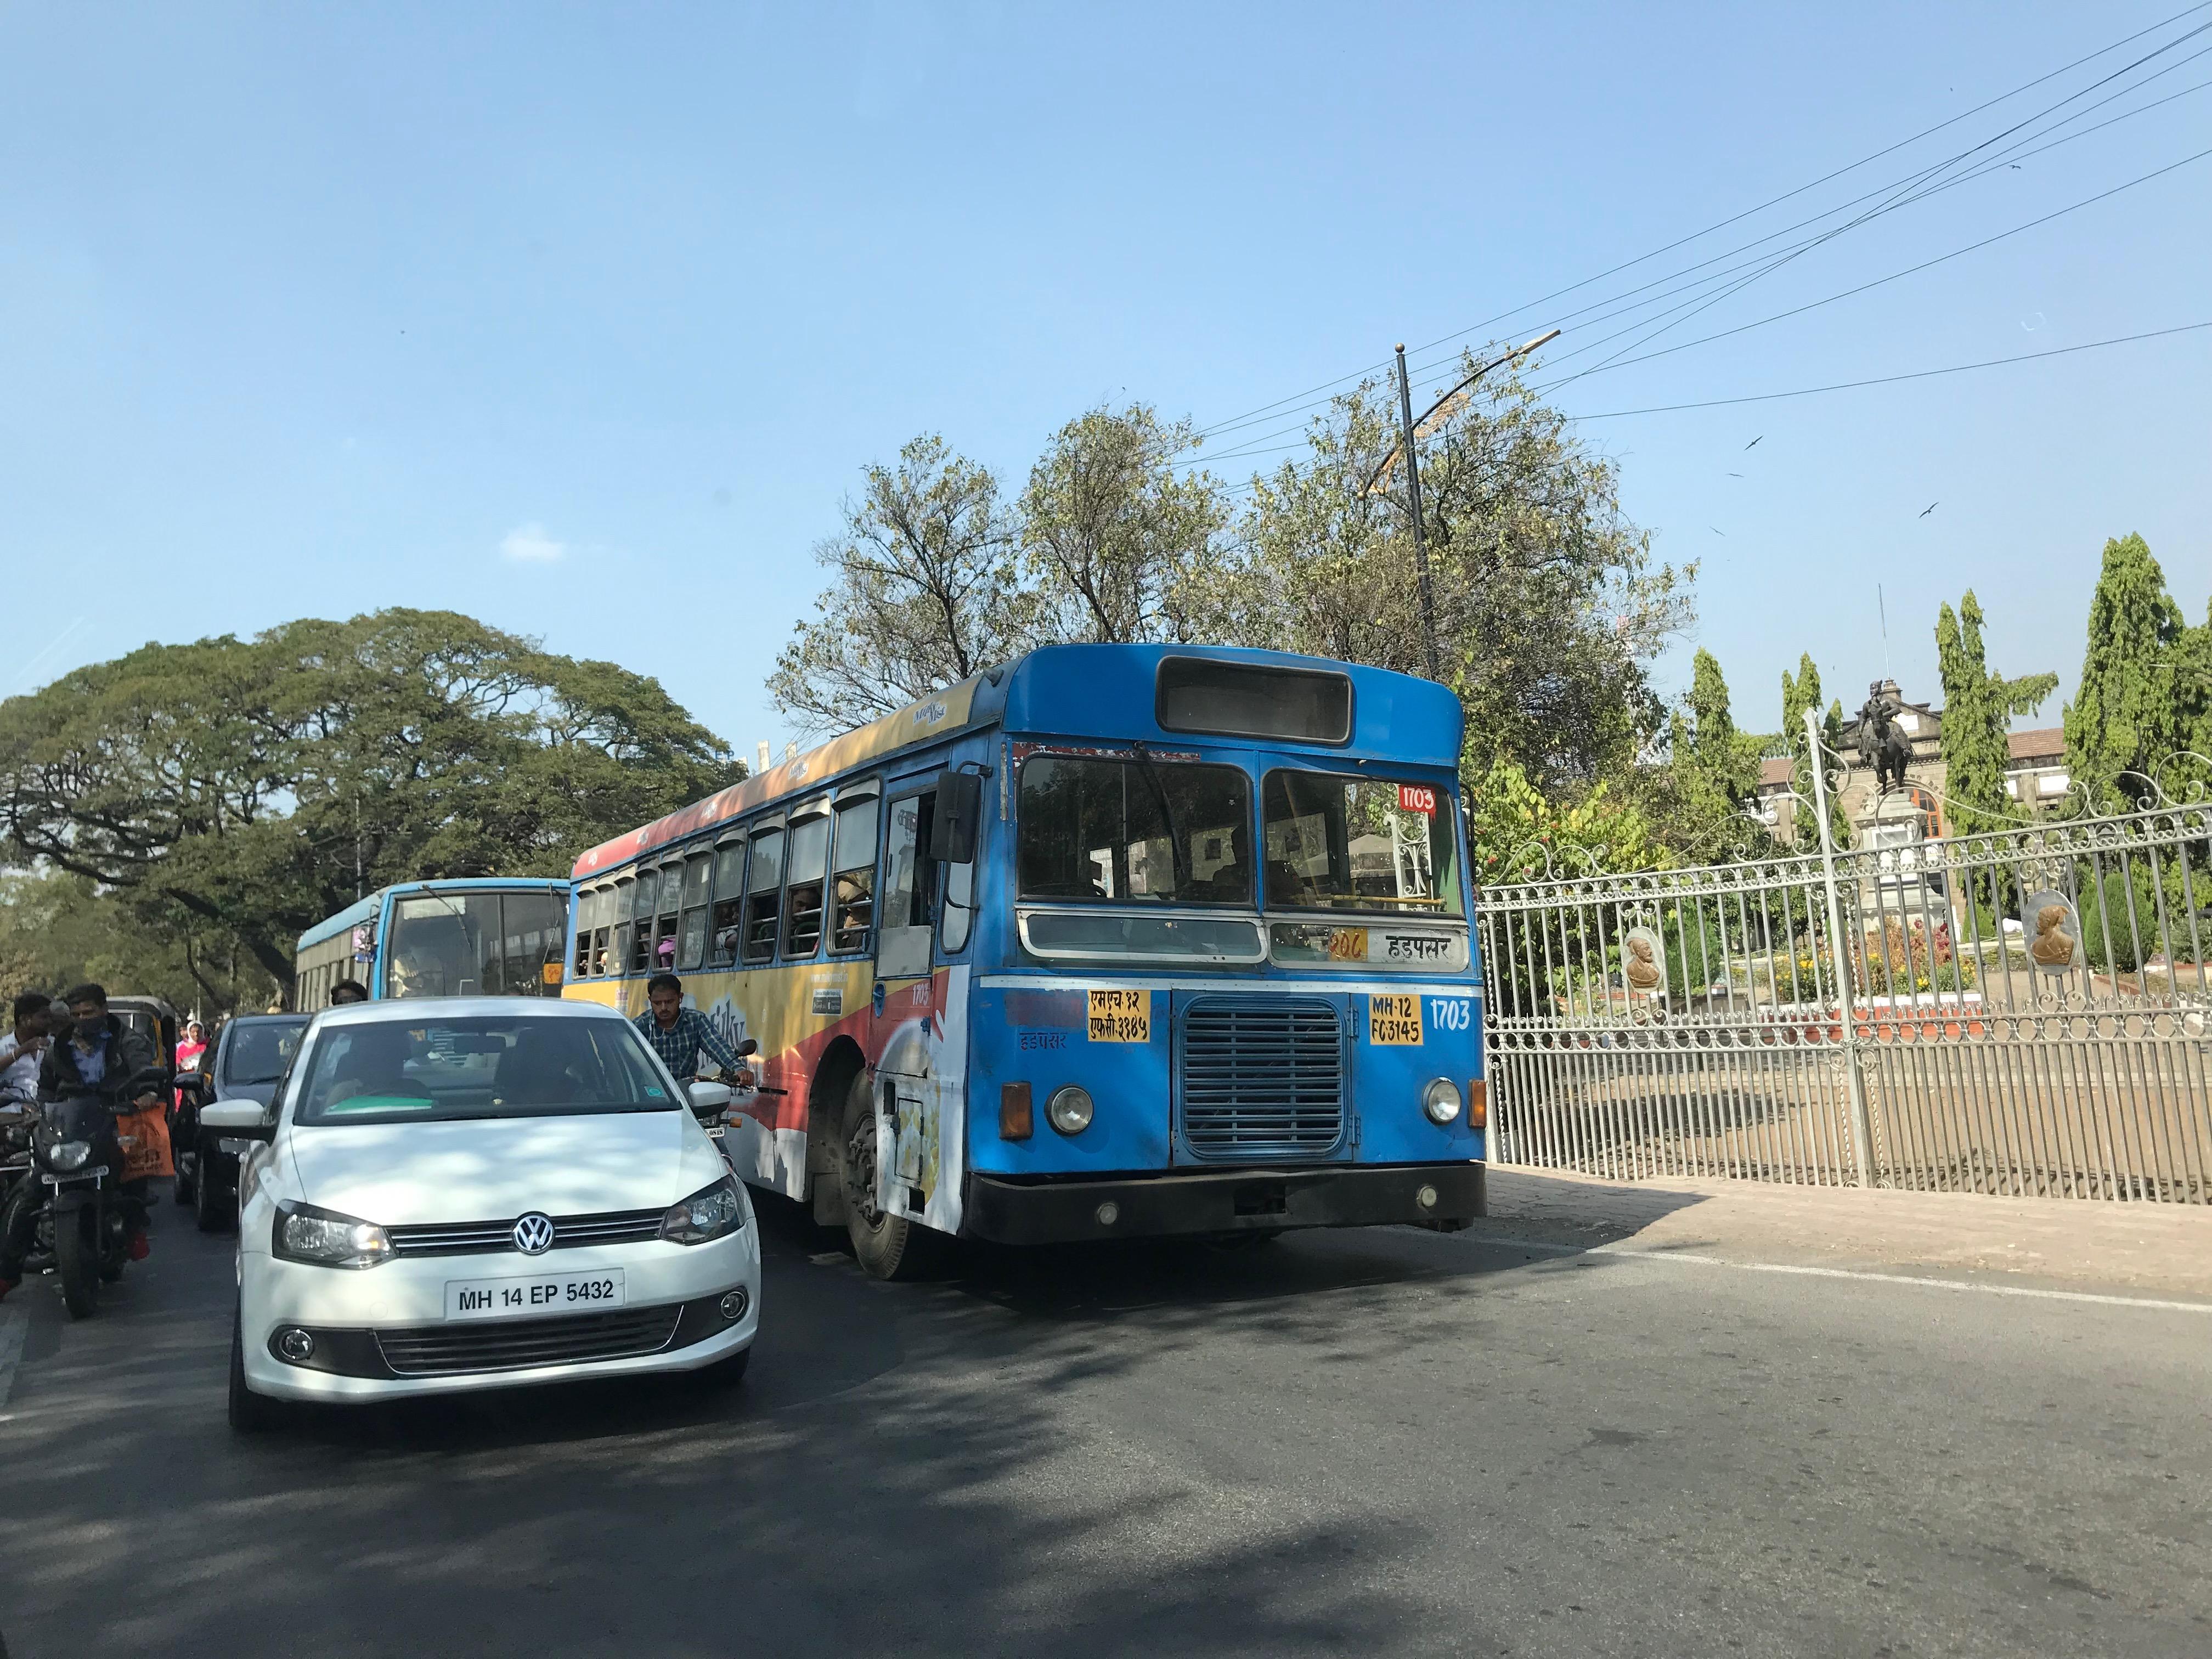 Leaving Pune